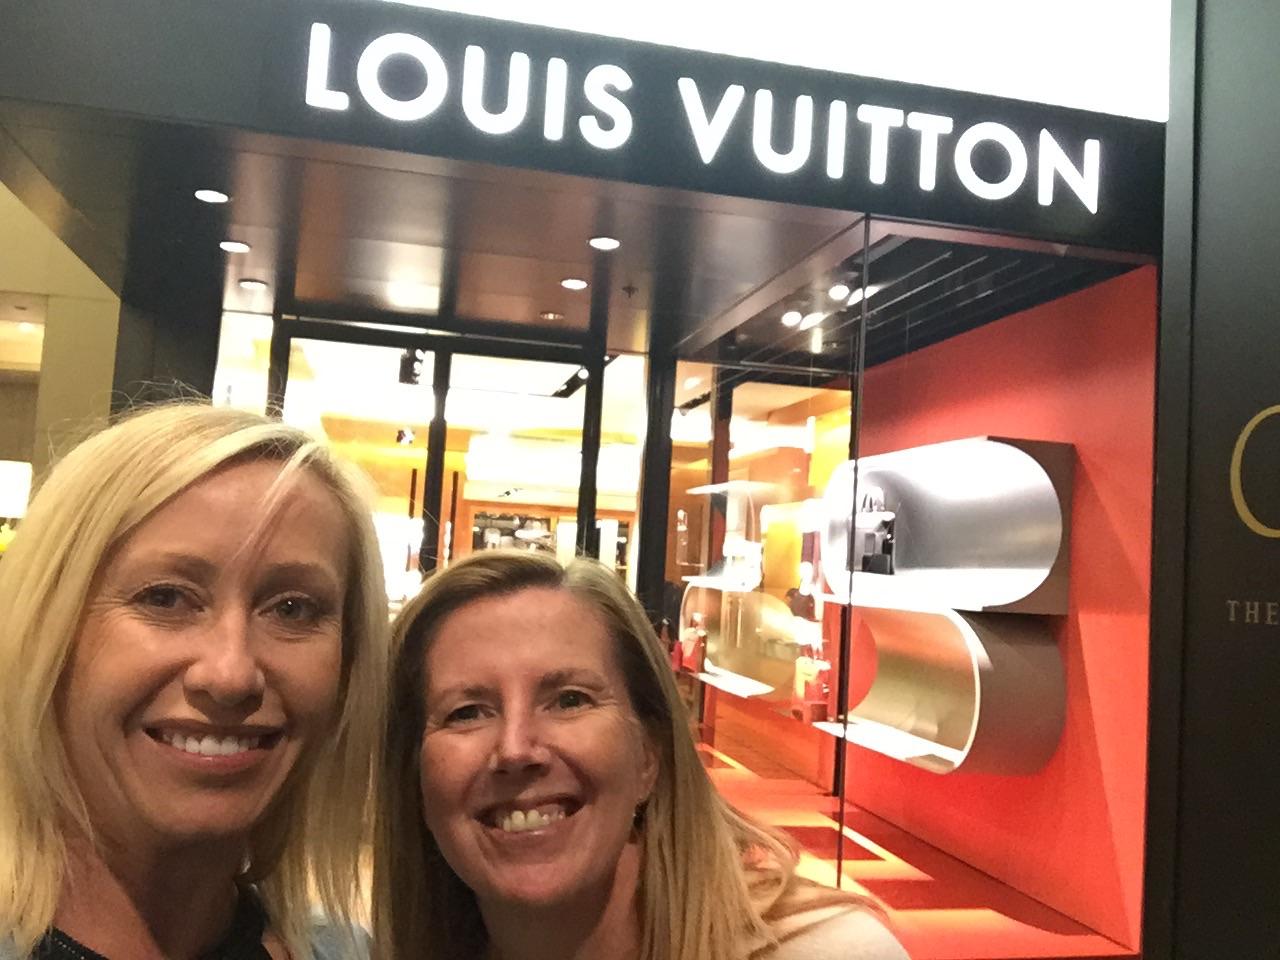 Sydney Fashion Hunter: Girls Weekend In Melbourne - Shopping At Crown Melbourne